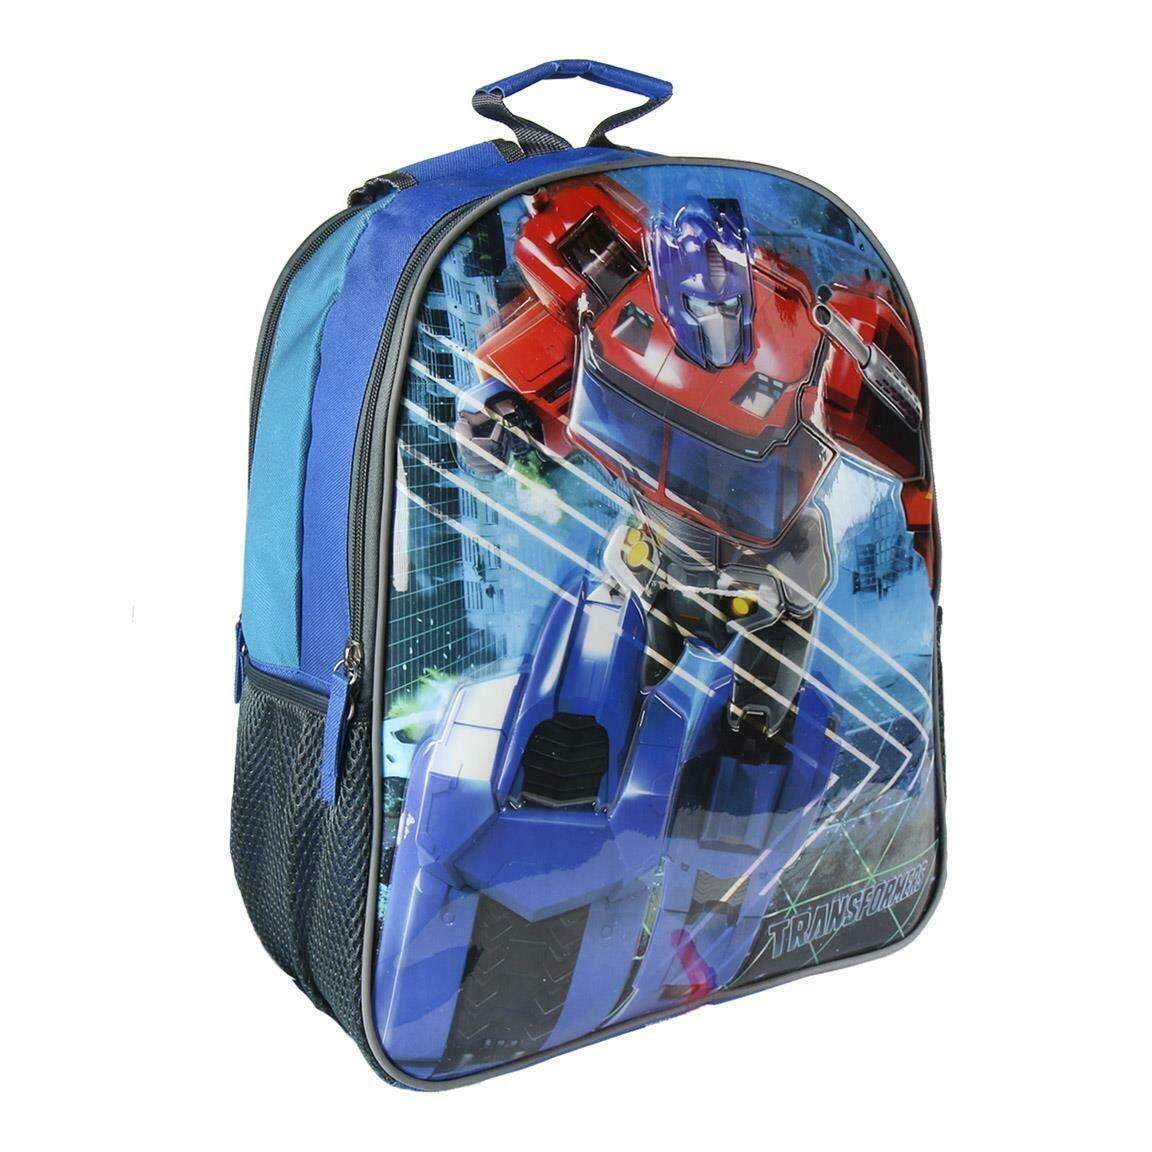 71vy04JFEHL - Cerda Mochila Escolar Reversible 2 en 1 para picnics al Aire Libre niños Bolsa de Almuerzo